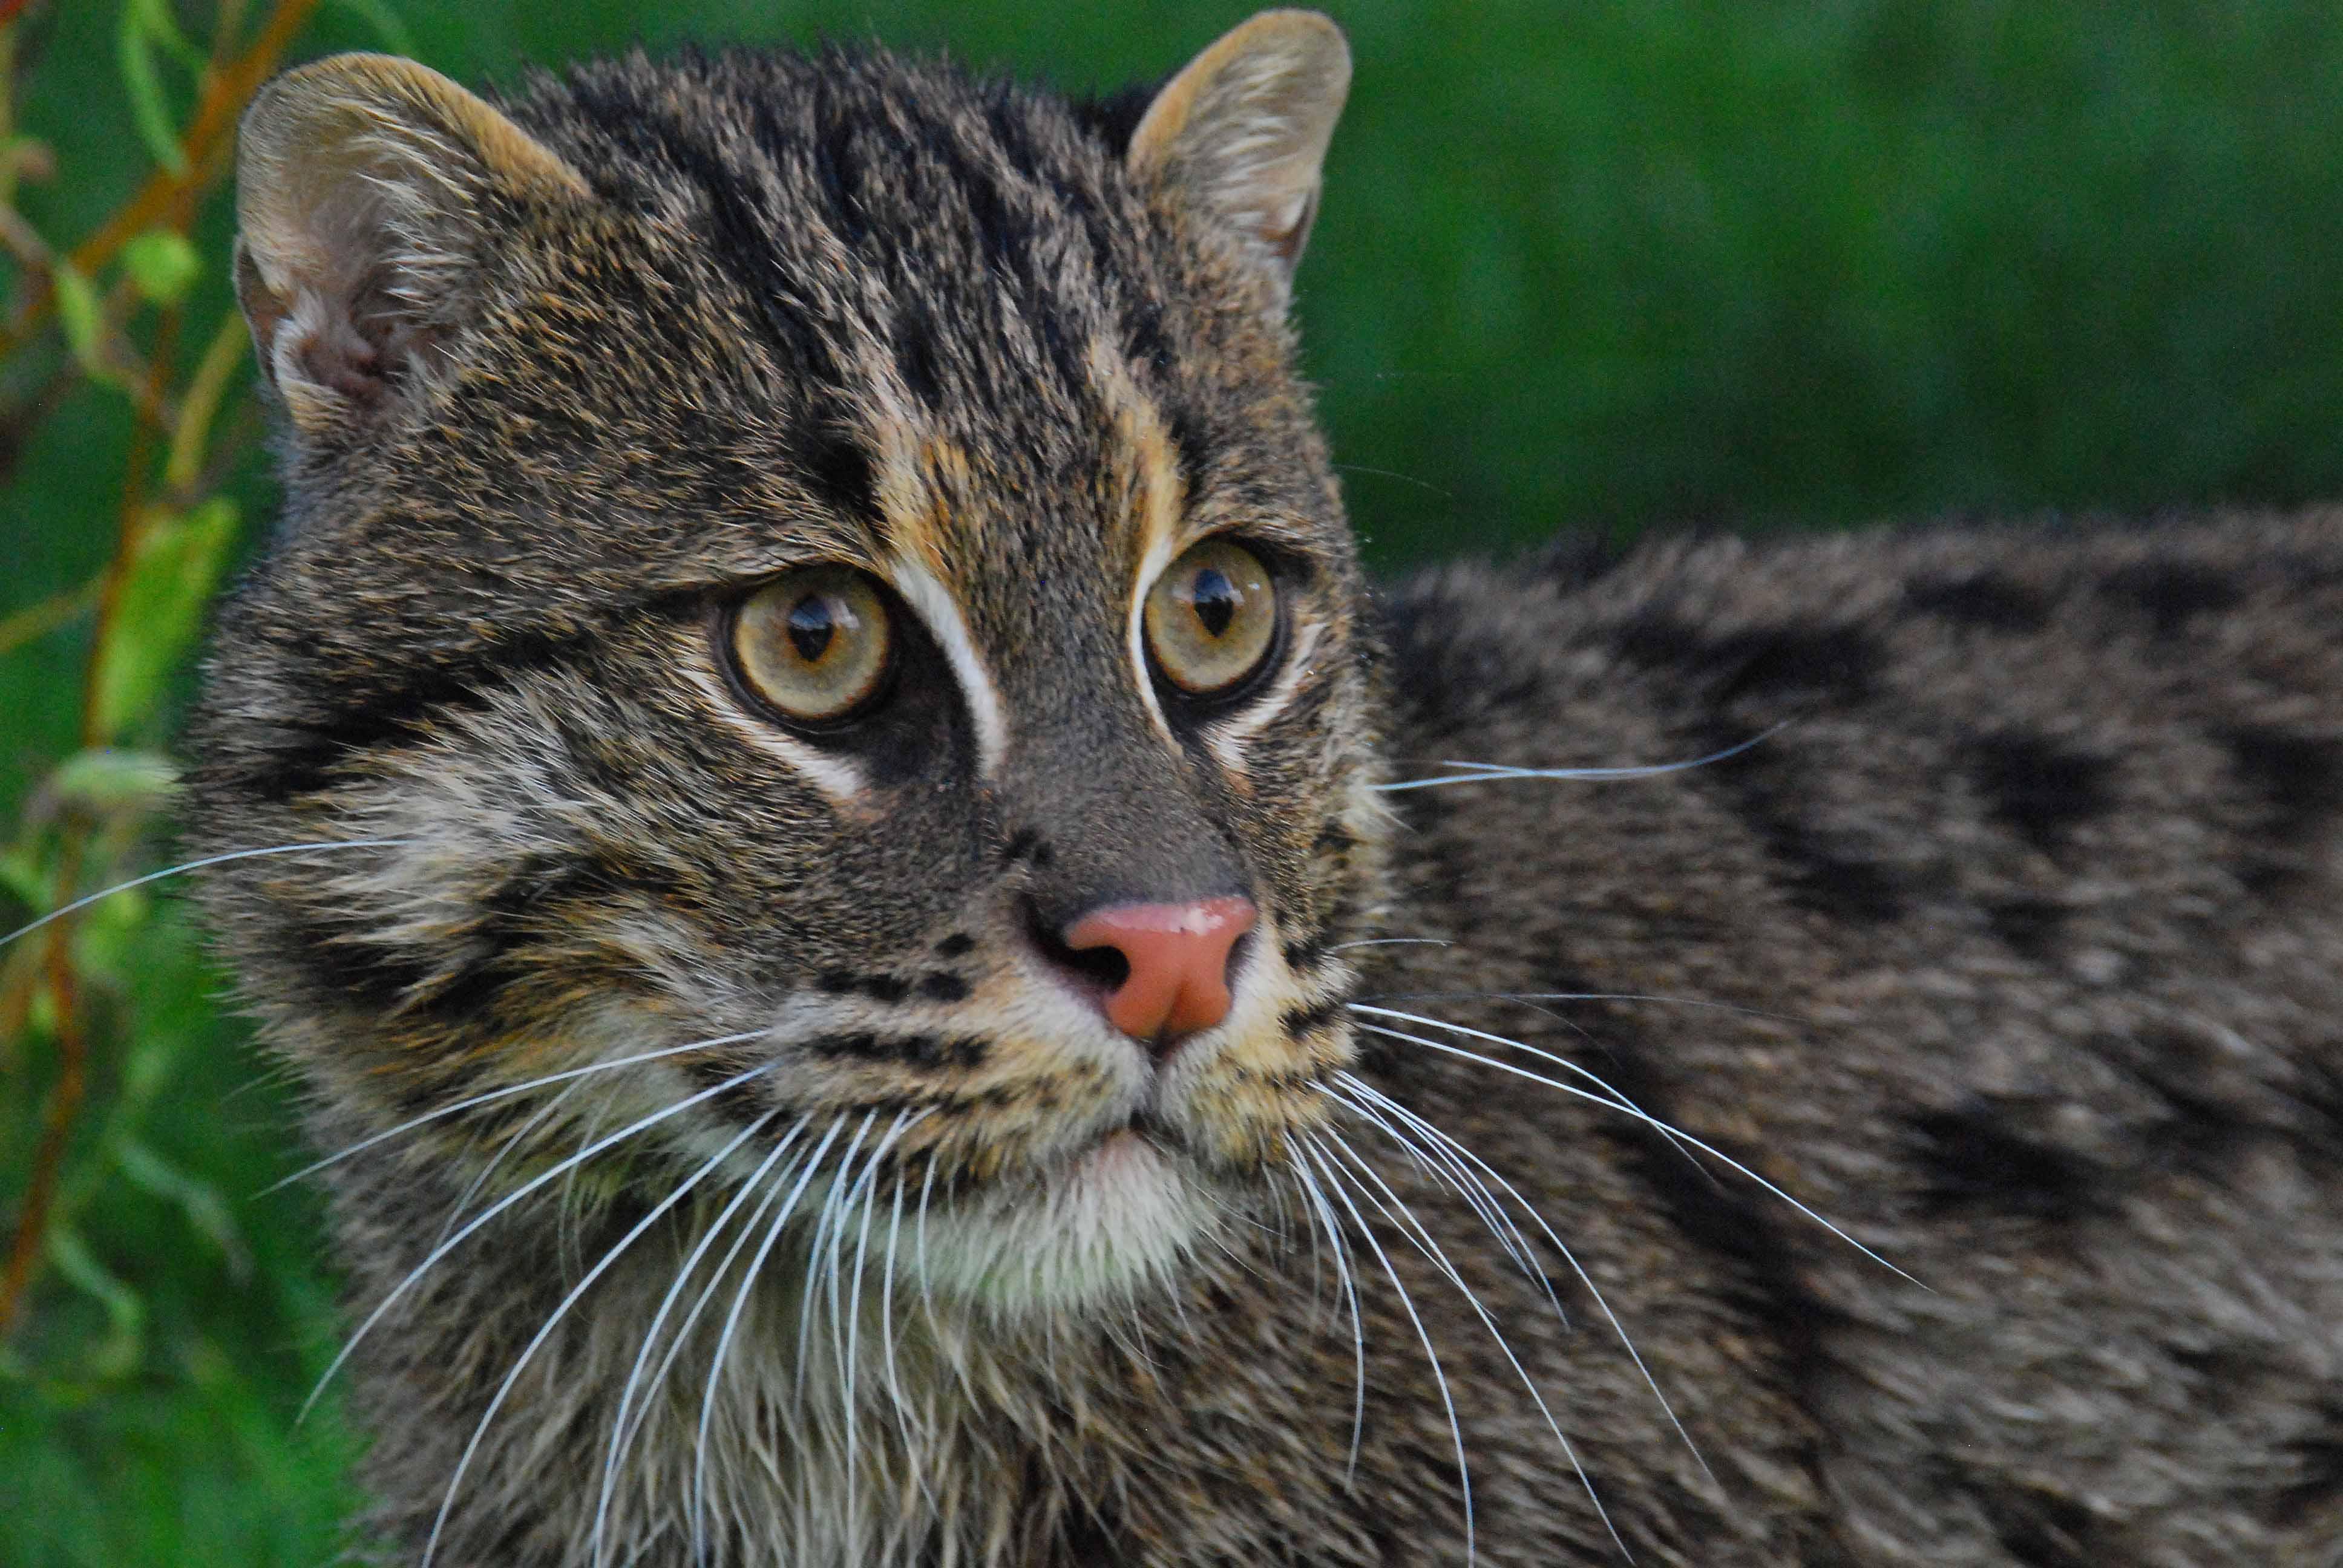 Granjas de langostinos de tailandia amenazan a raros gatos for Fish video for cats